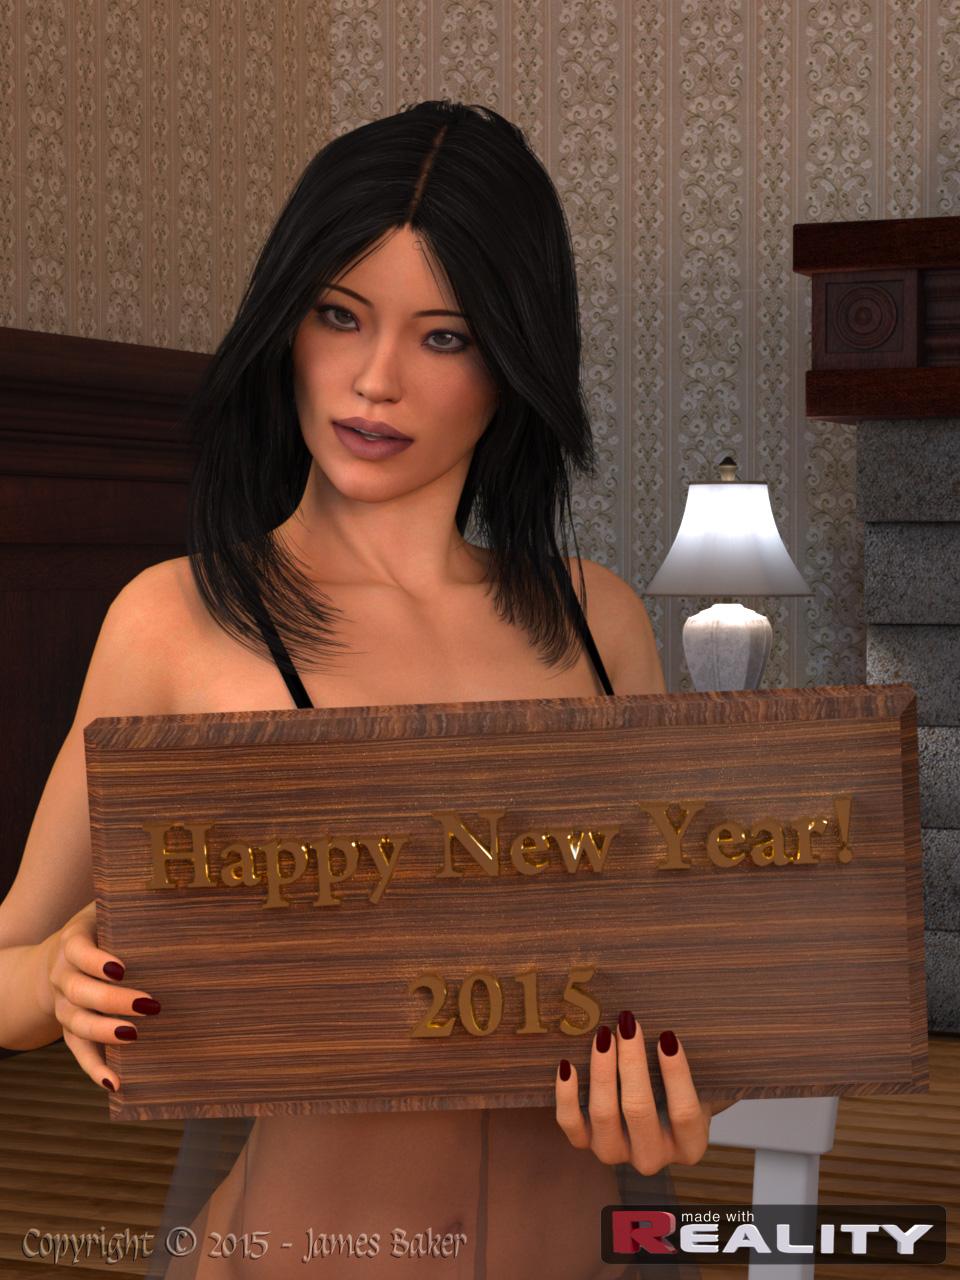 Happy New Year 2015 by odhinnsrunes